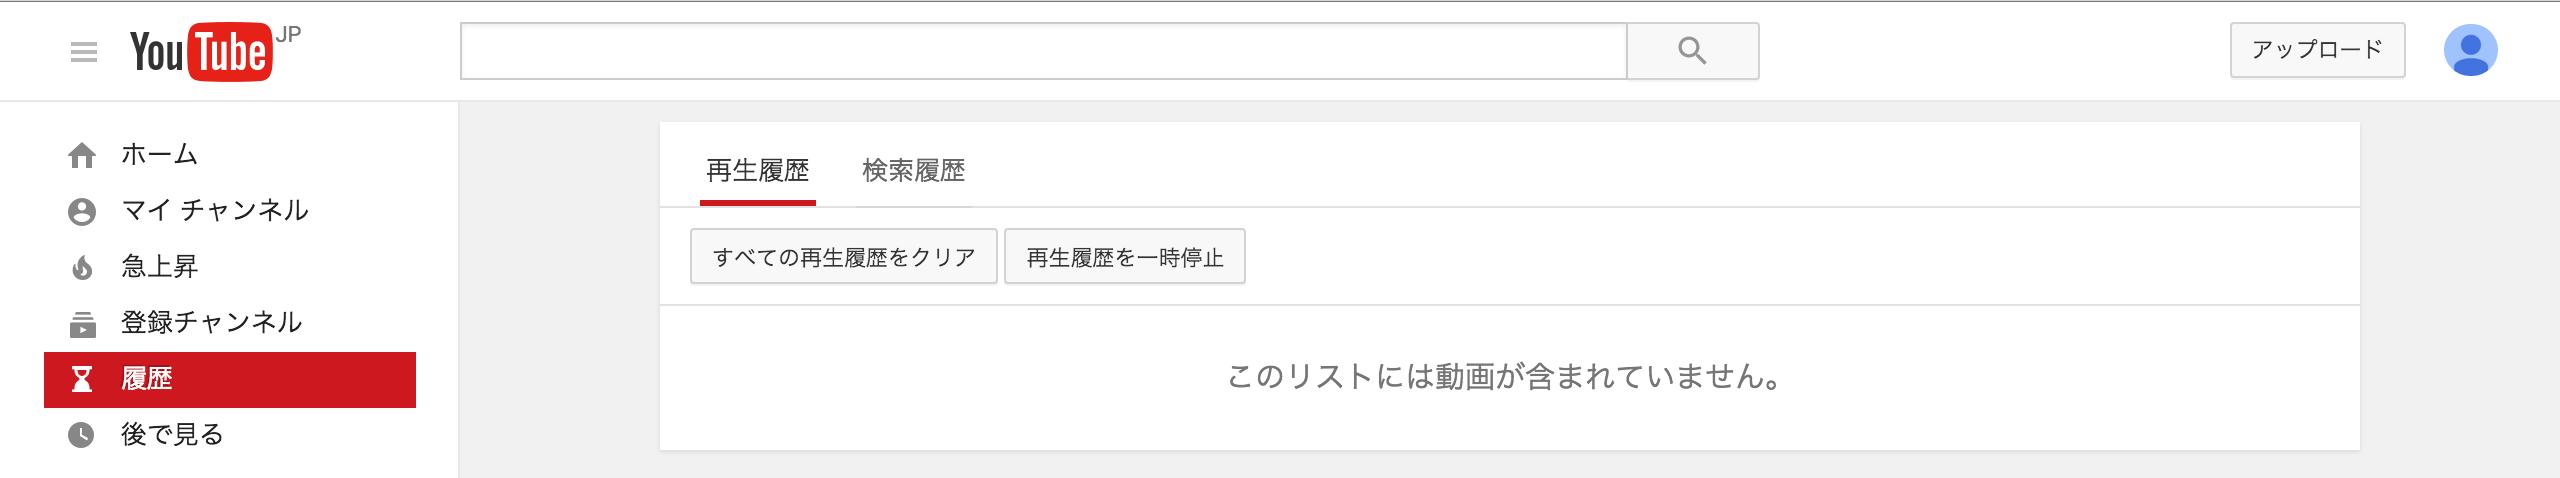 youtube19